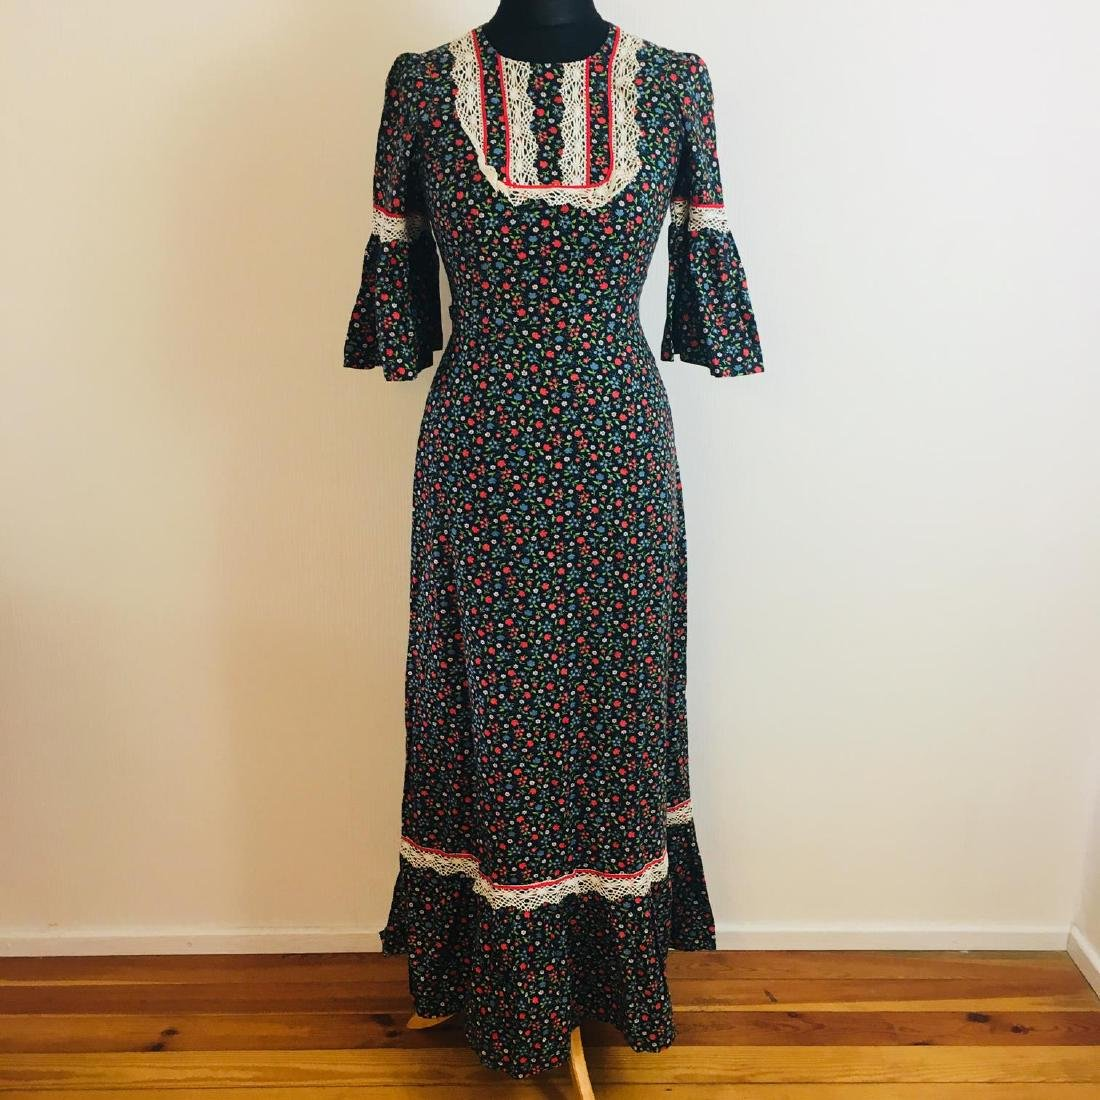 Vintage Women's Tyrolean Style Dress Size EUR 36 US 6